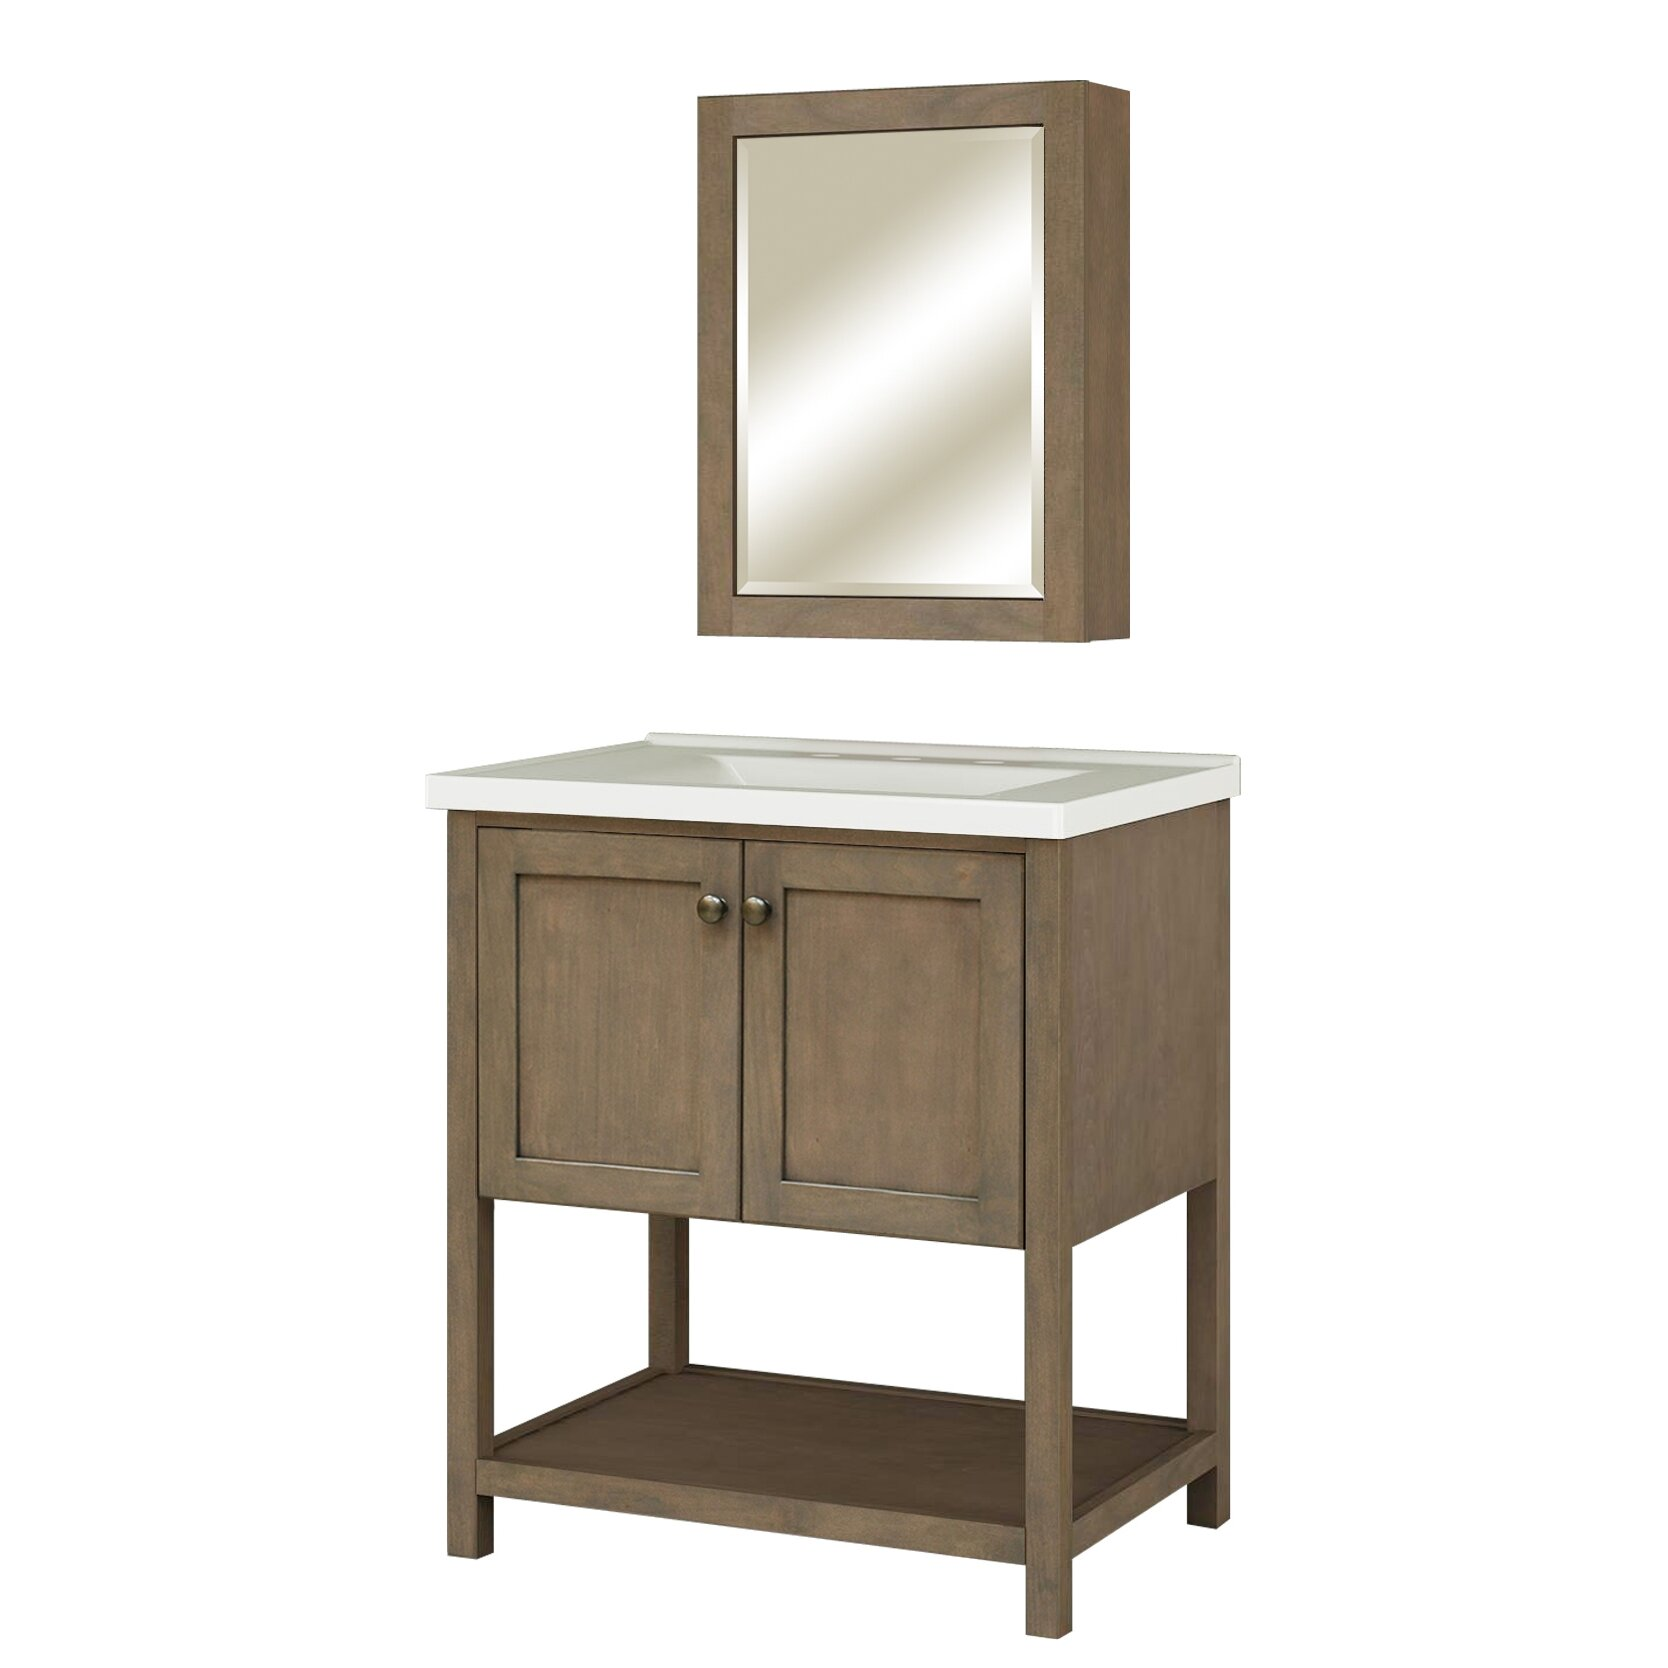 Sunnywood Kitchen Cabinets Sunny Wood Aiden 20 X 26 Surface Mount Medicine Cabinet Wayfair